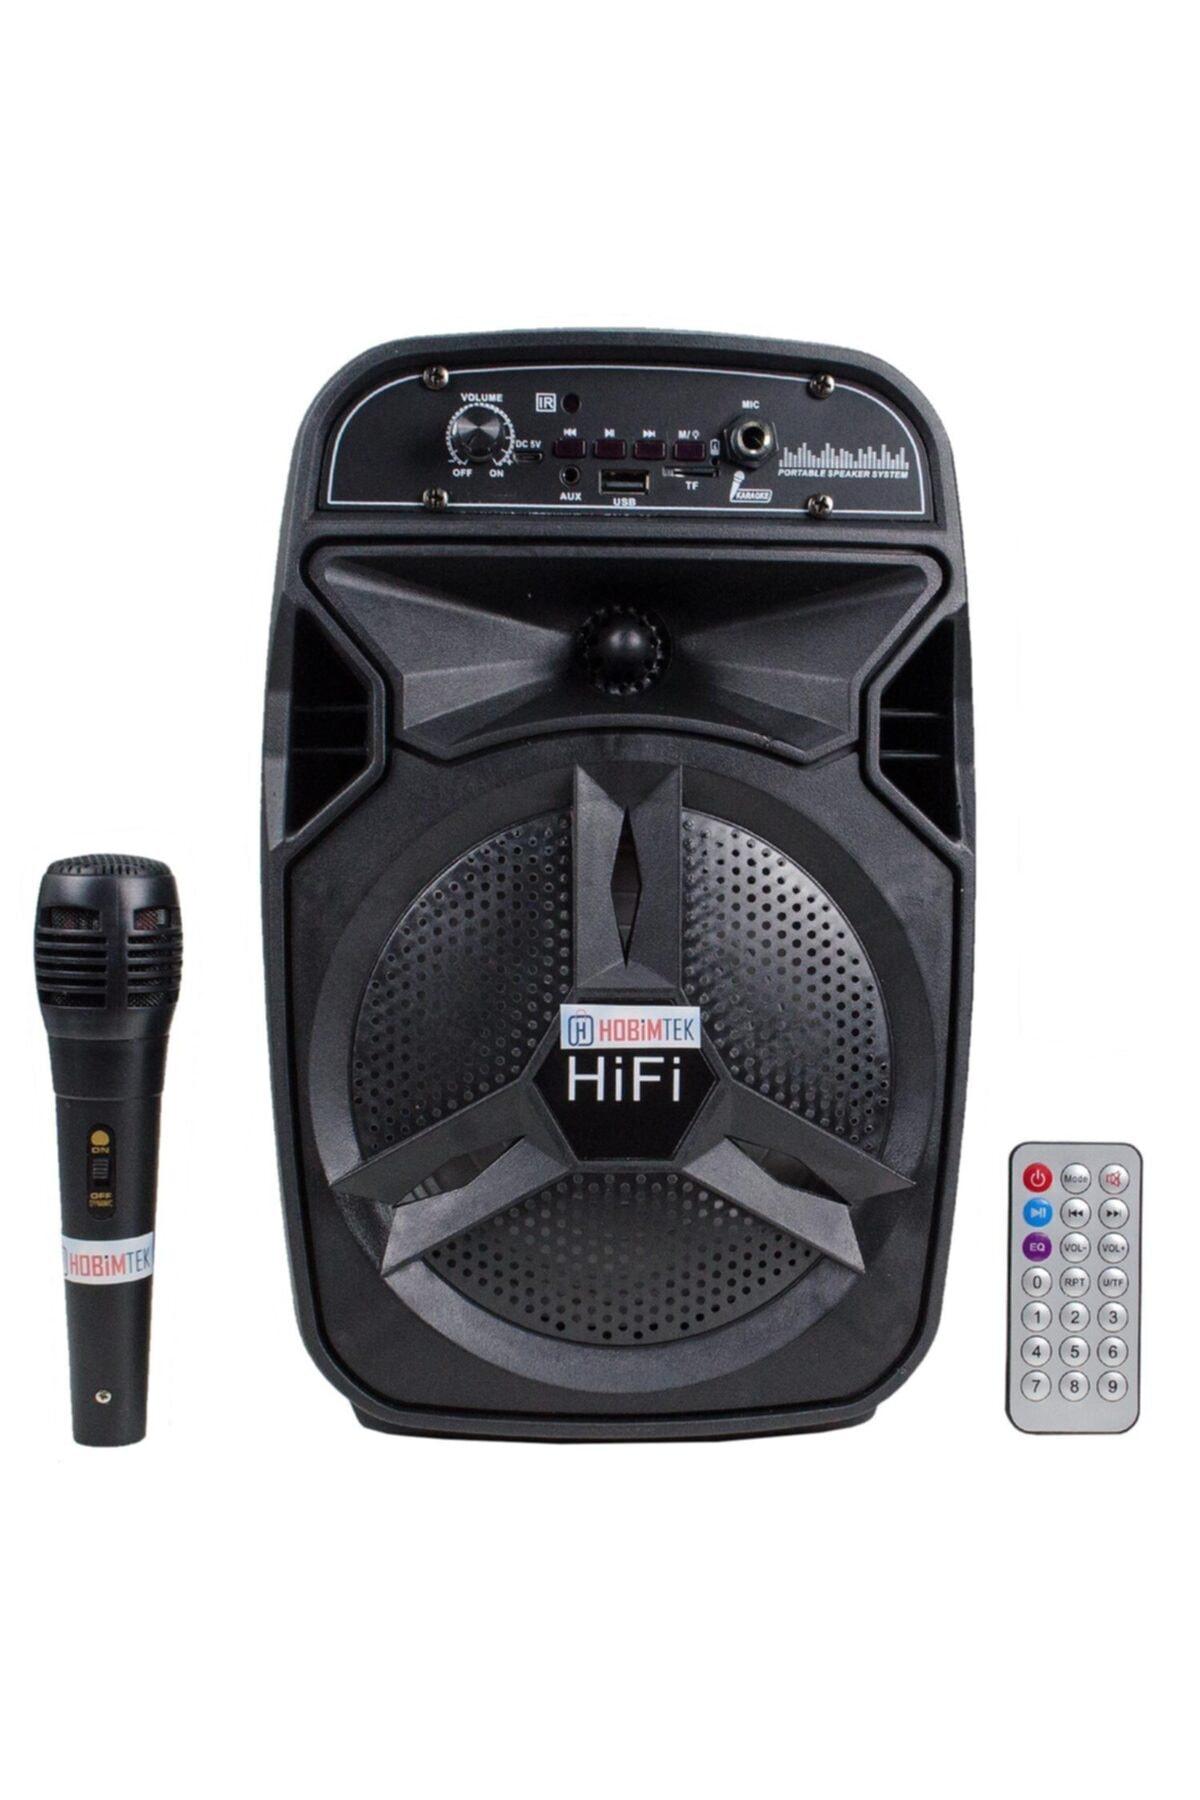 Bt-06 نظام موسيقي كاريوكي مع بلوتوث قابلة للشحن المحمولة راديو Fm Aux Led ميكروفون مكبر صوت كبير